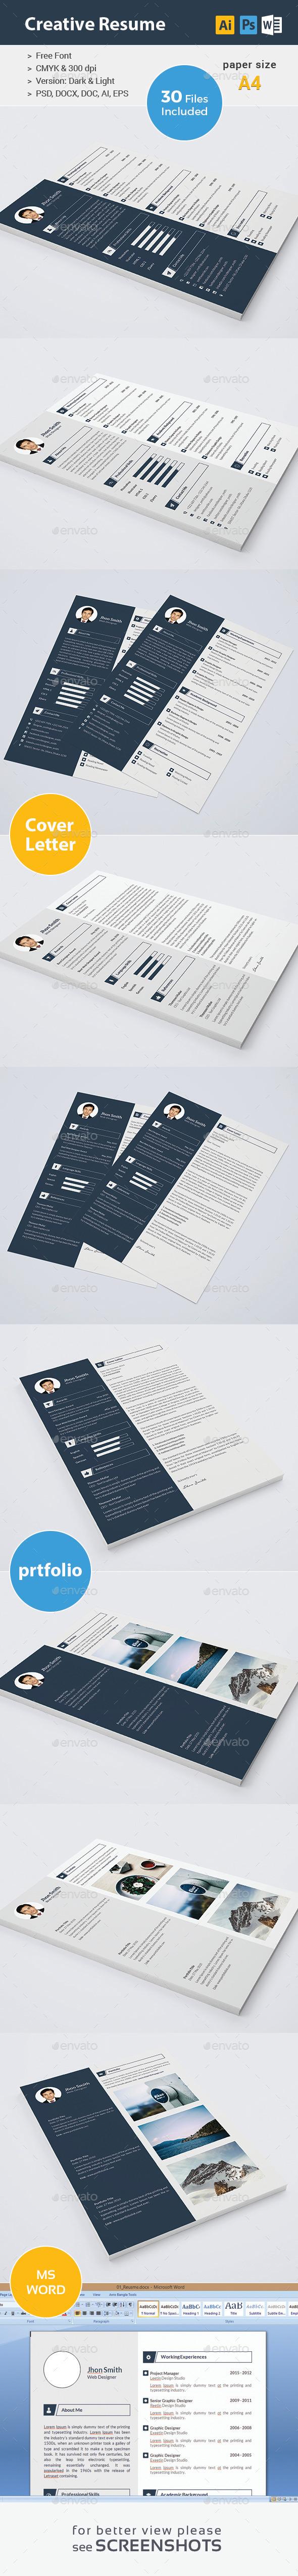 Resume - 02